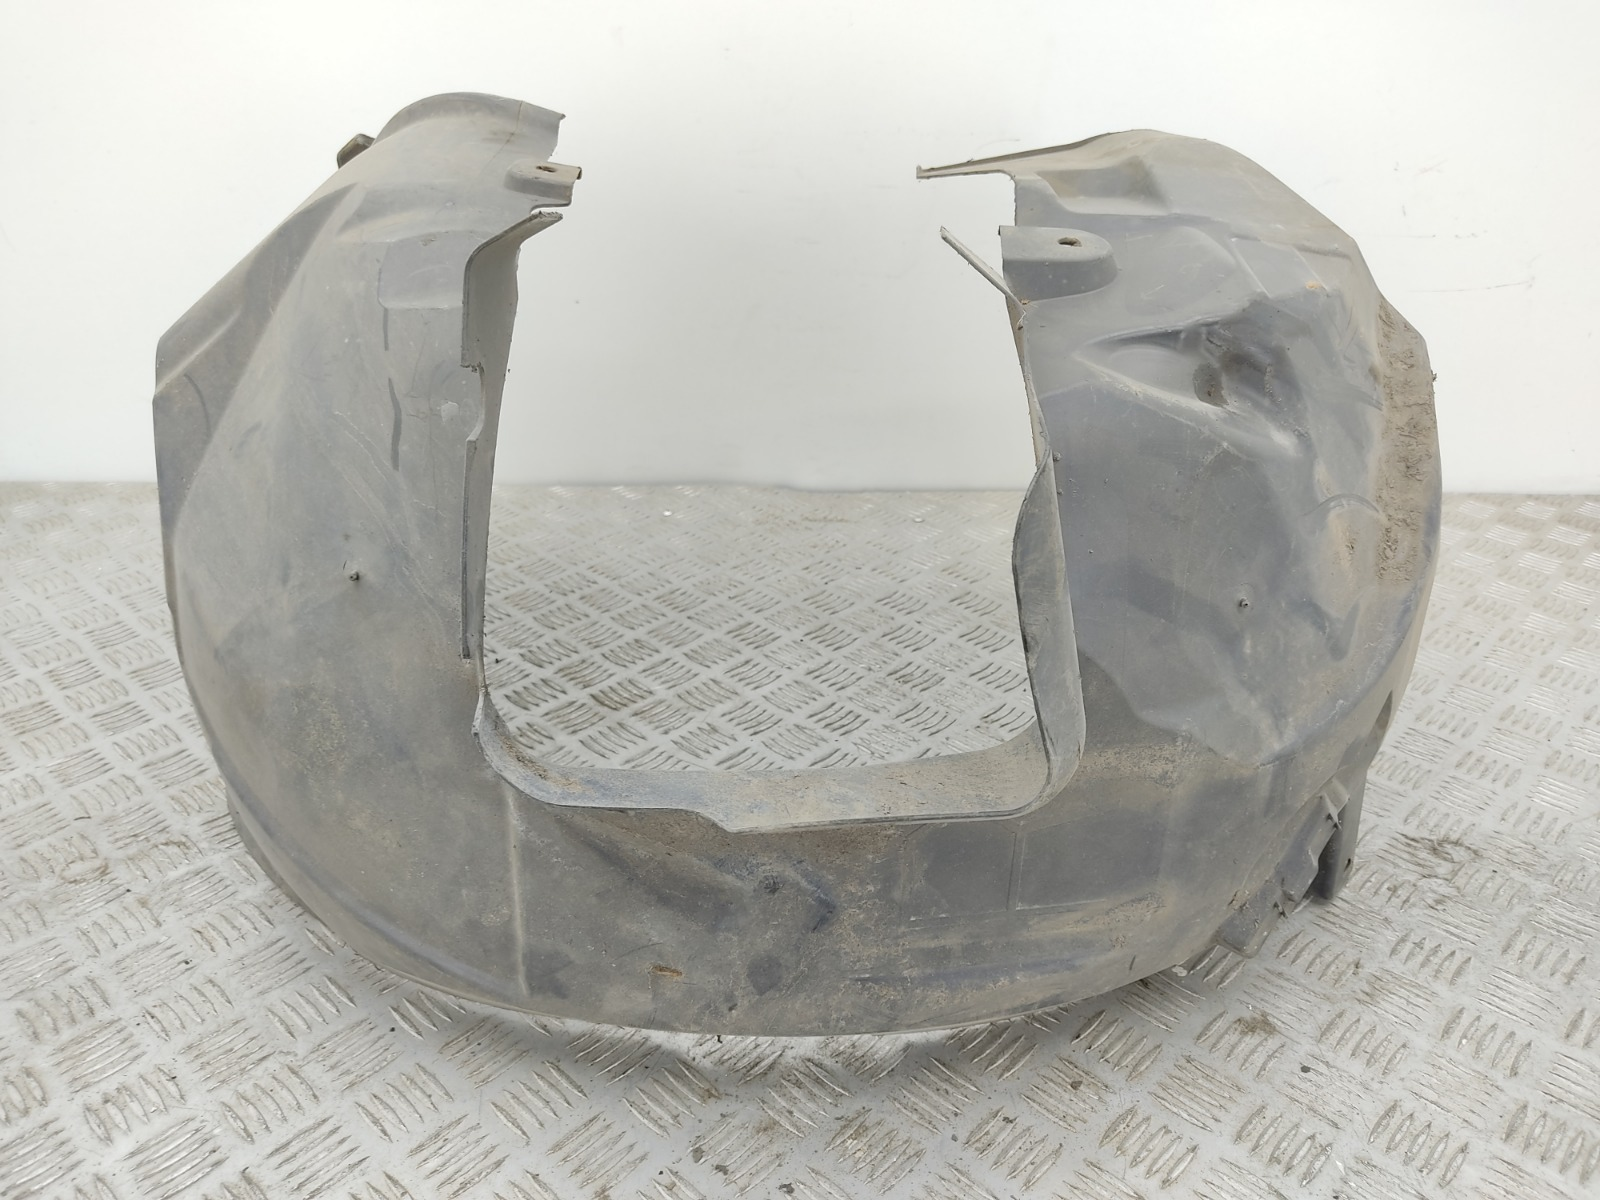 Защита арок передняя правая (подкрылок) Ford Mondeo 2.0 TDCI 2007 (б/у)